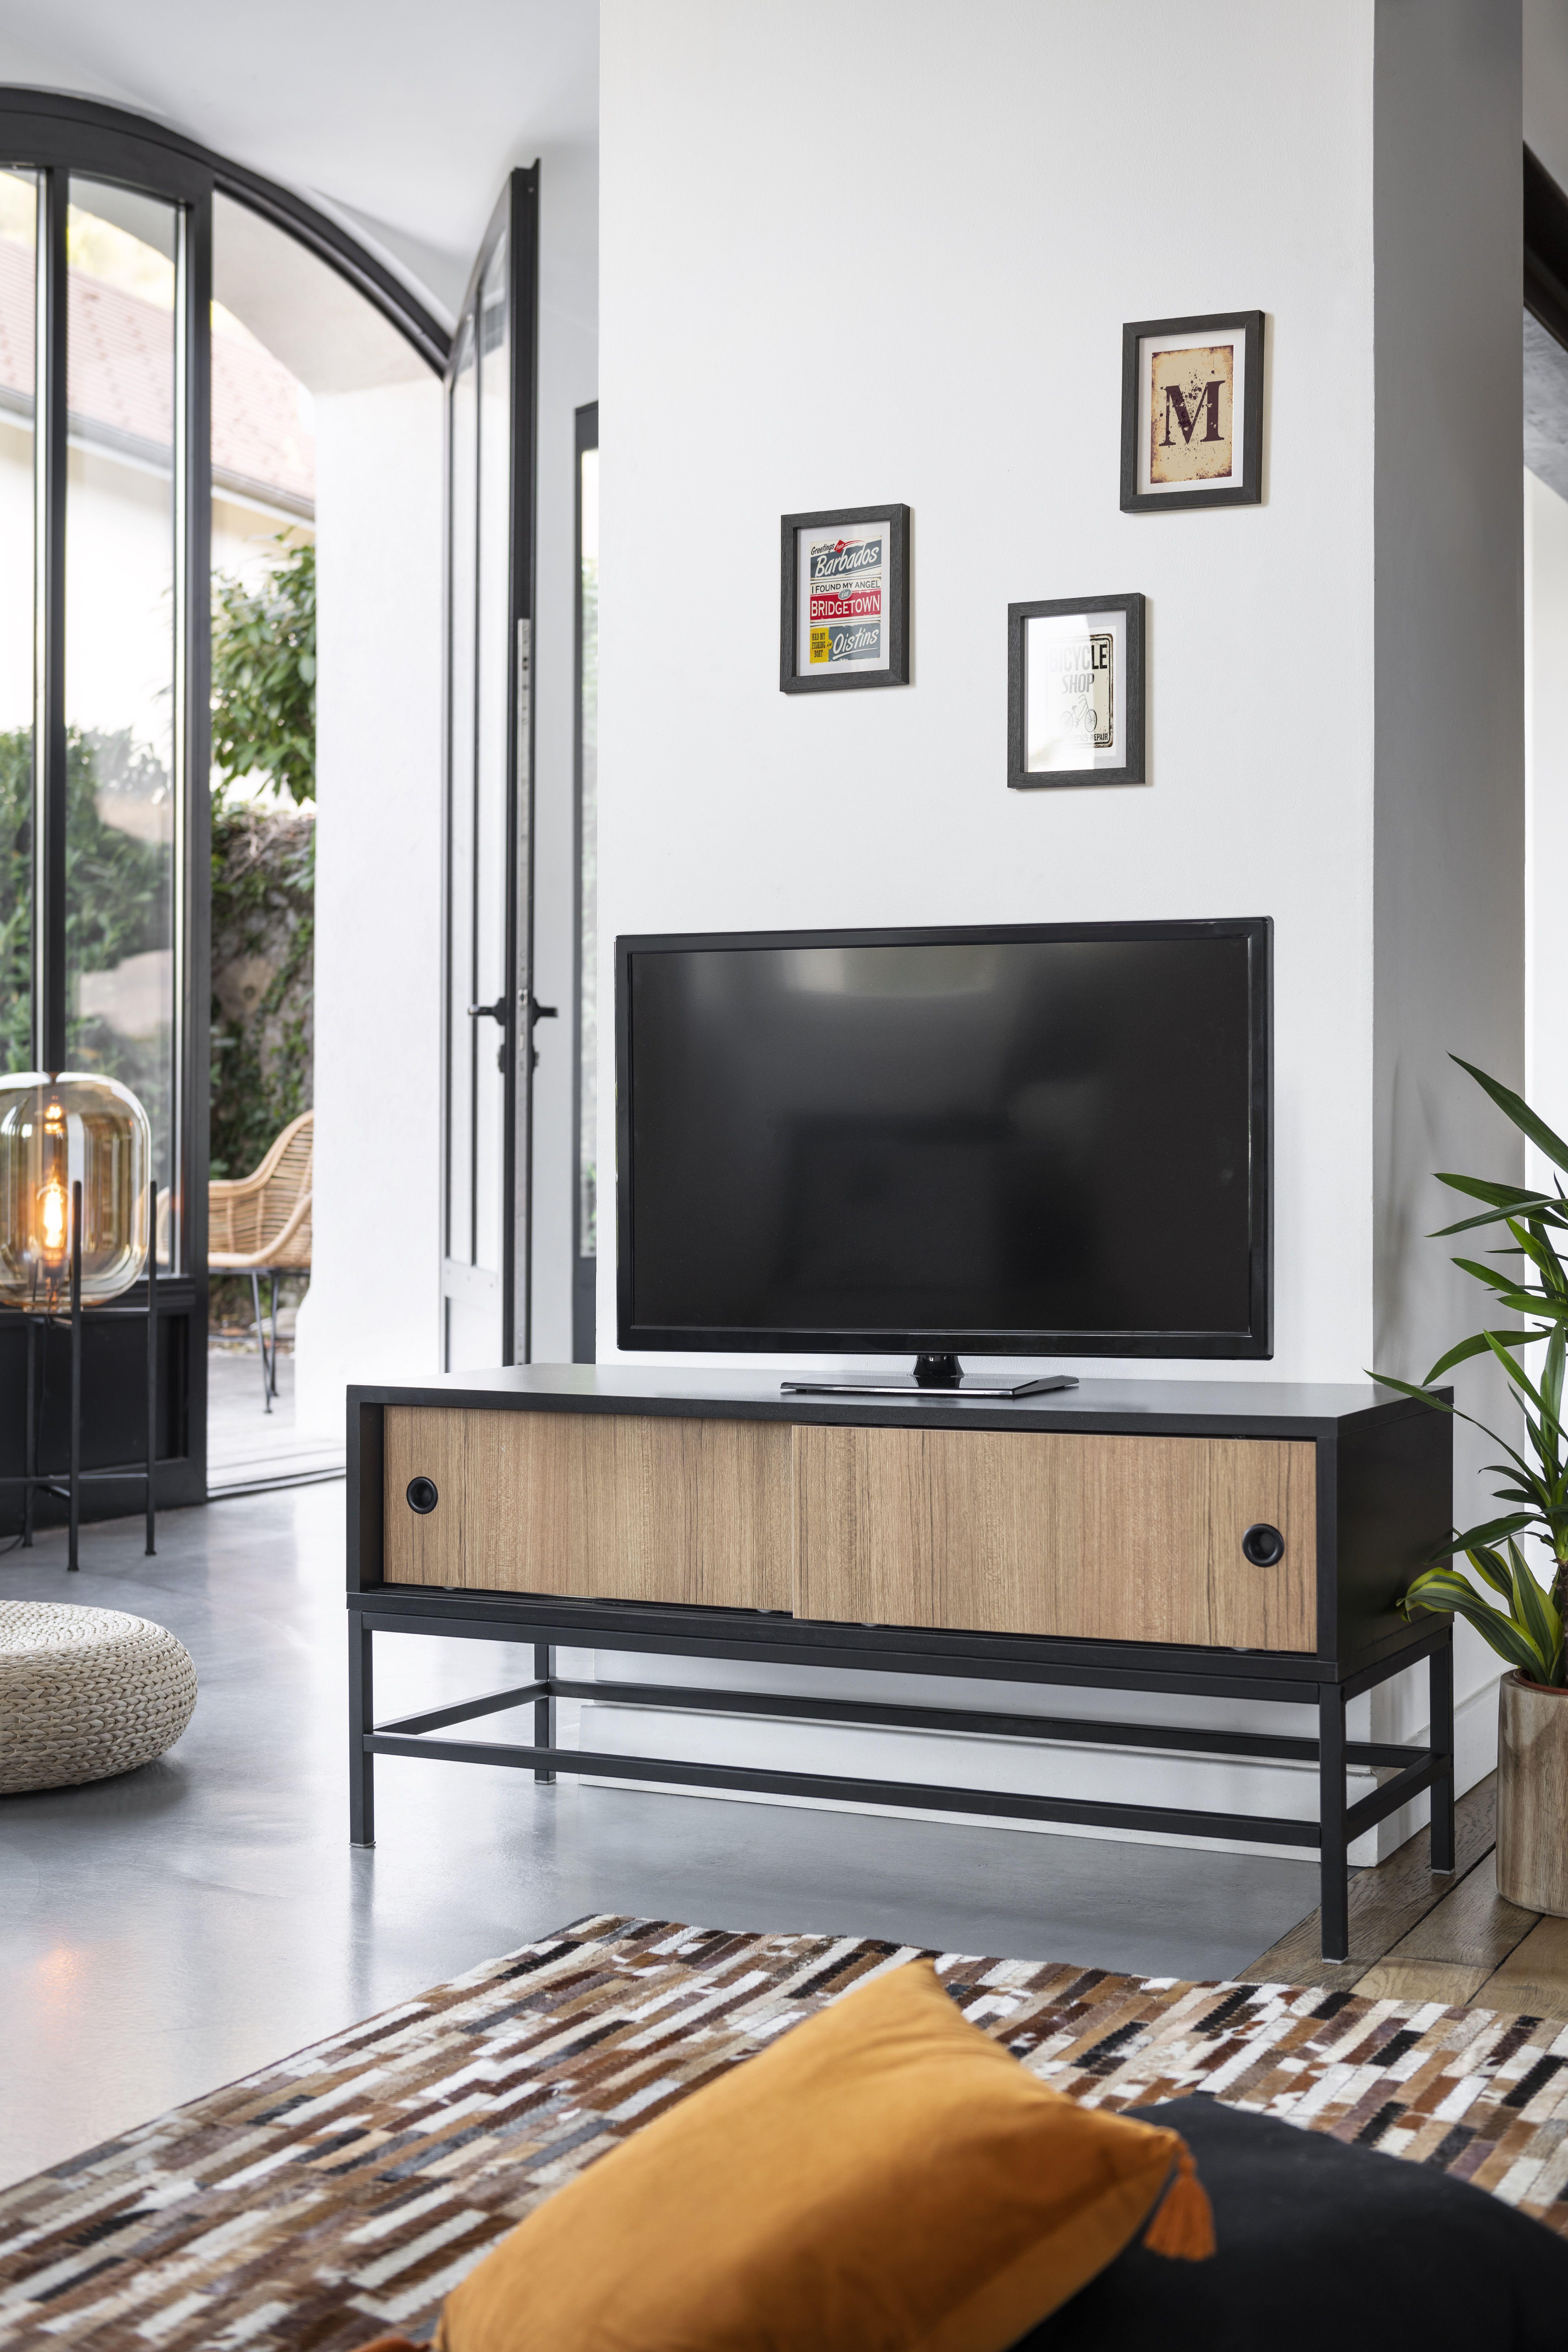 Meuble Tv Mobilier De Salon Meuble Et Meuble Tv